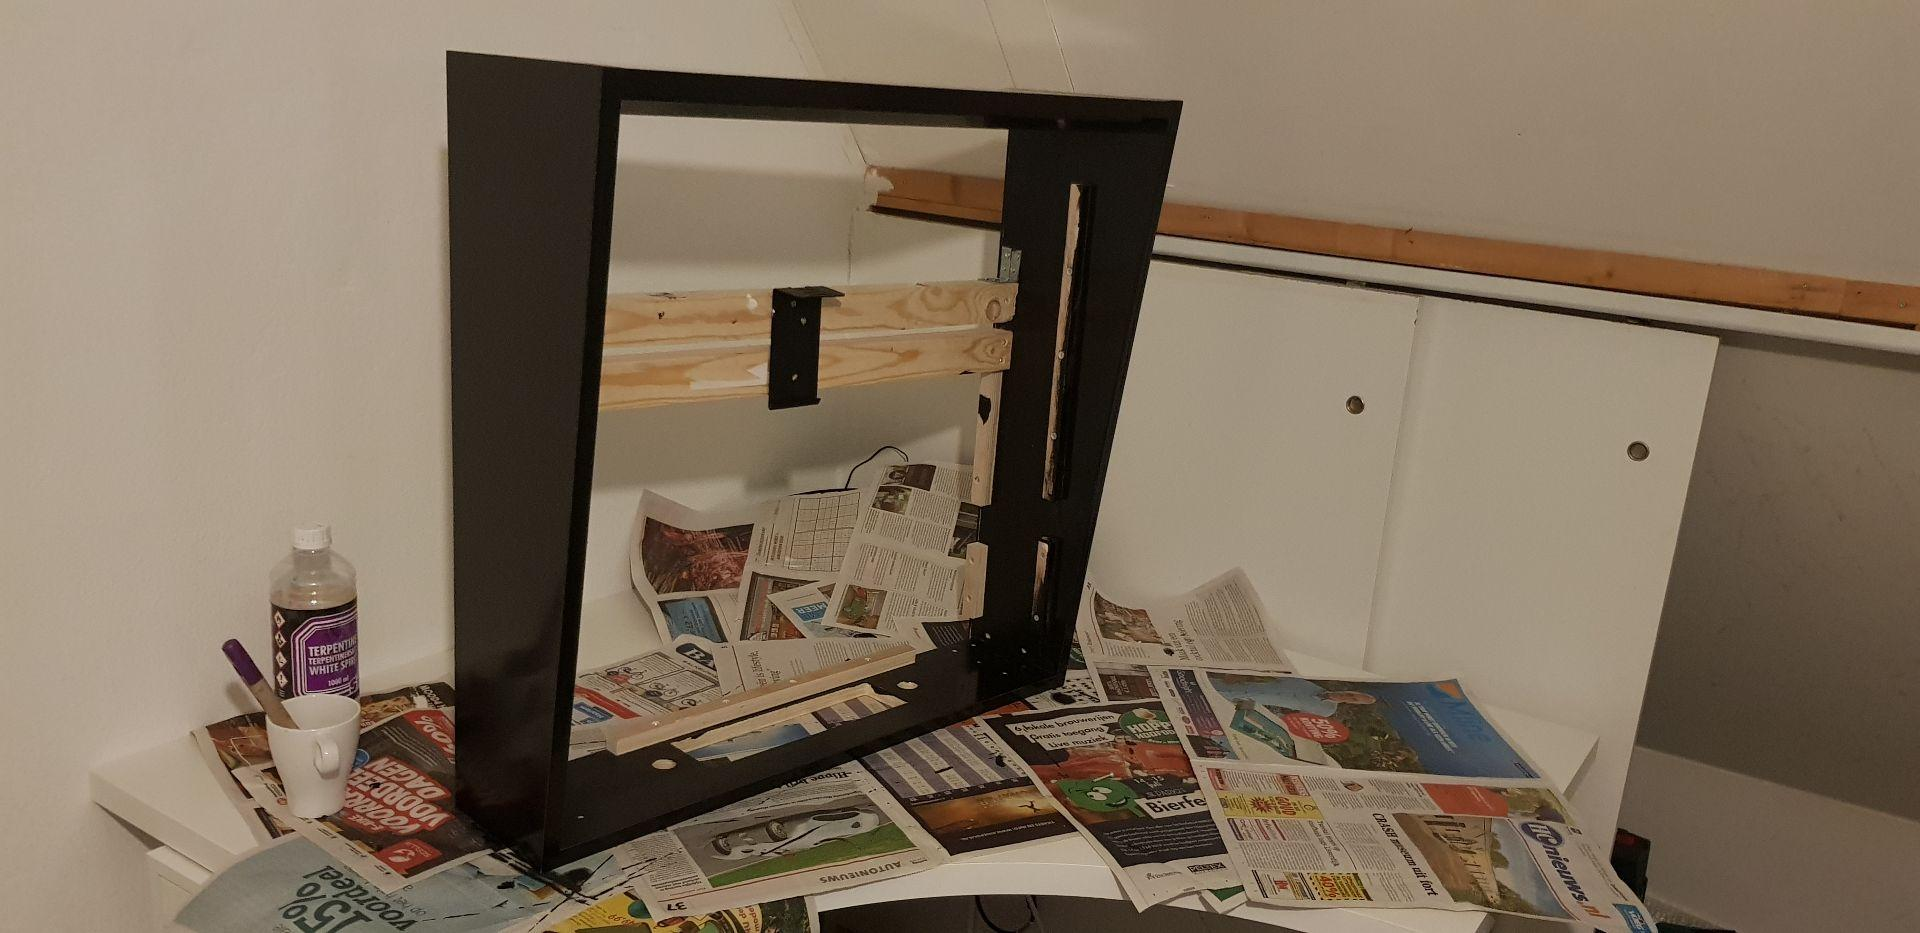 Home made Virtual Pinball Cabinet - Gamer Rigs - Spesoft Forums